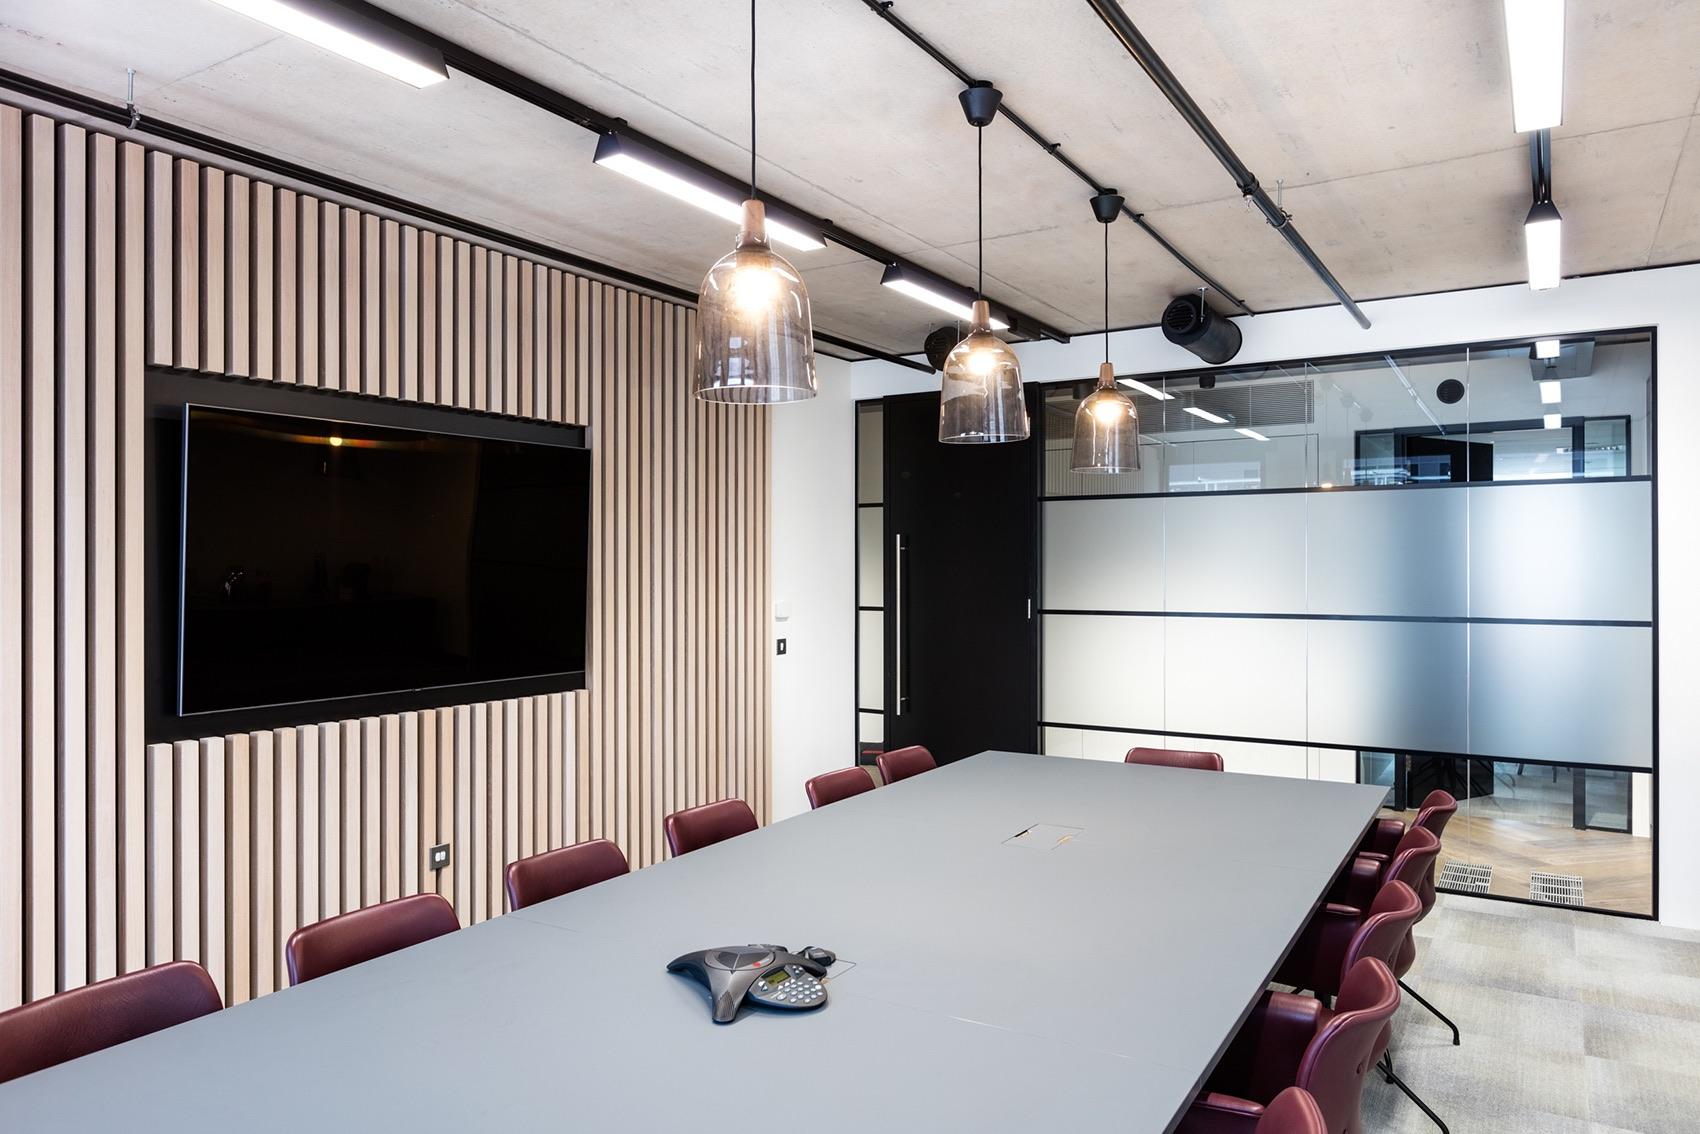 albion-capital-london-office-1